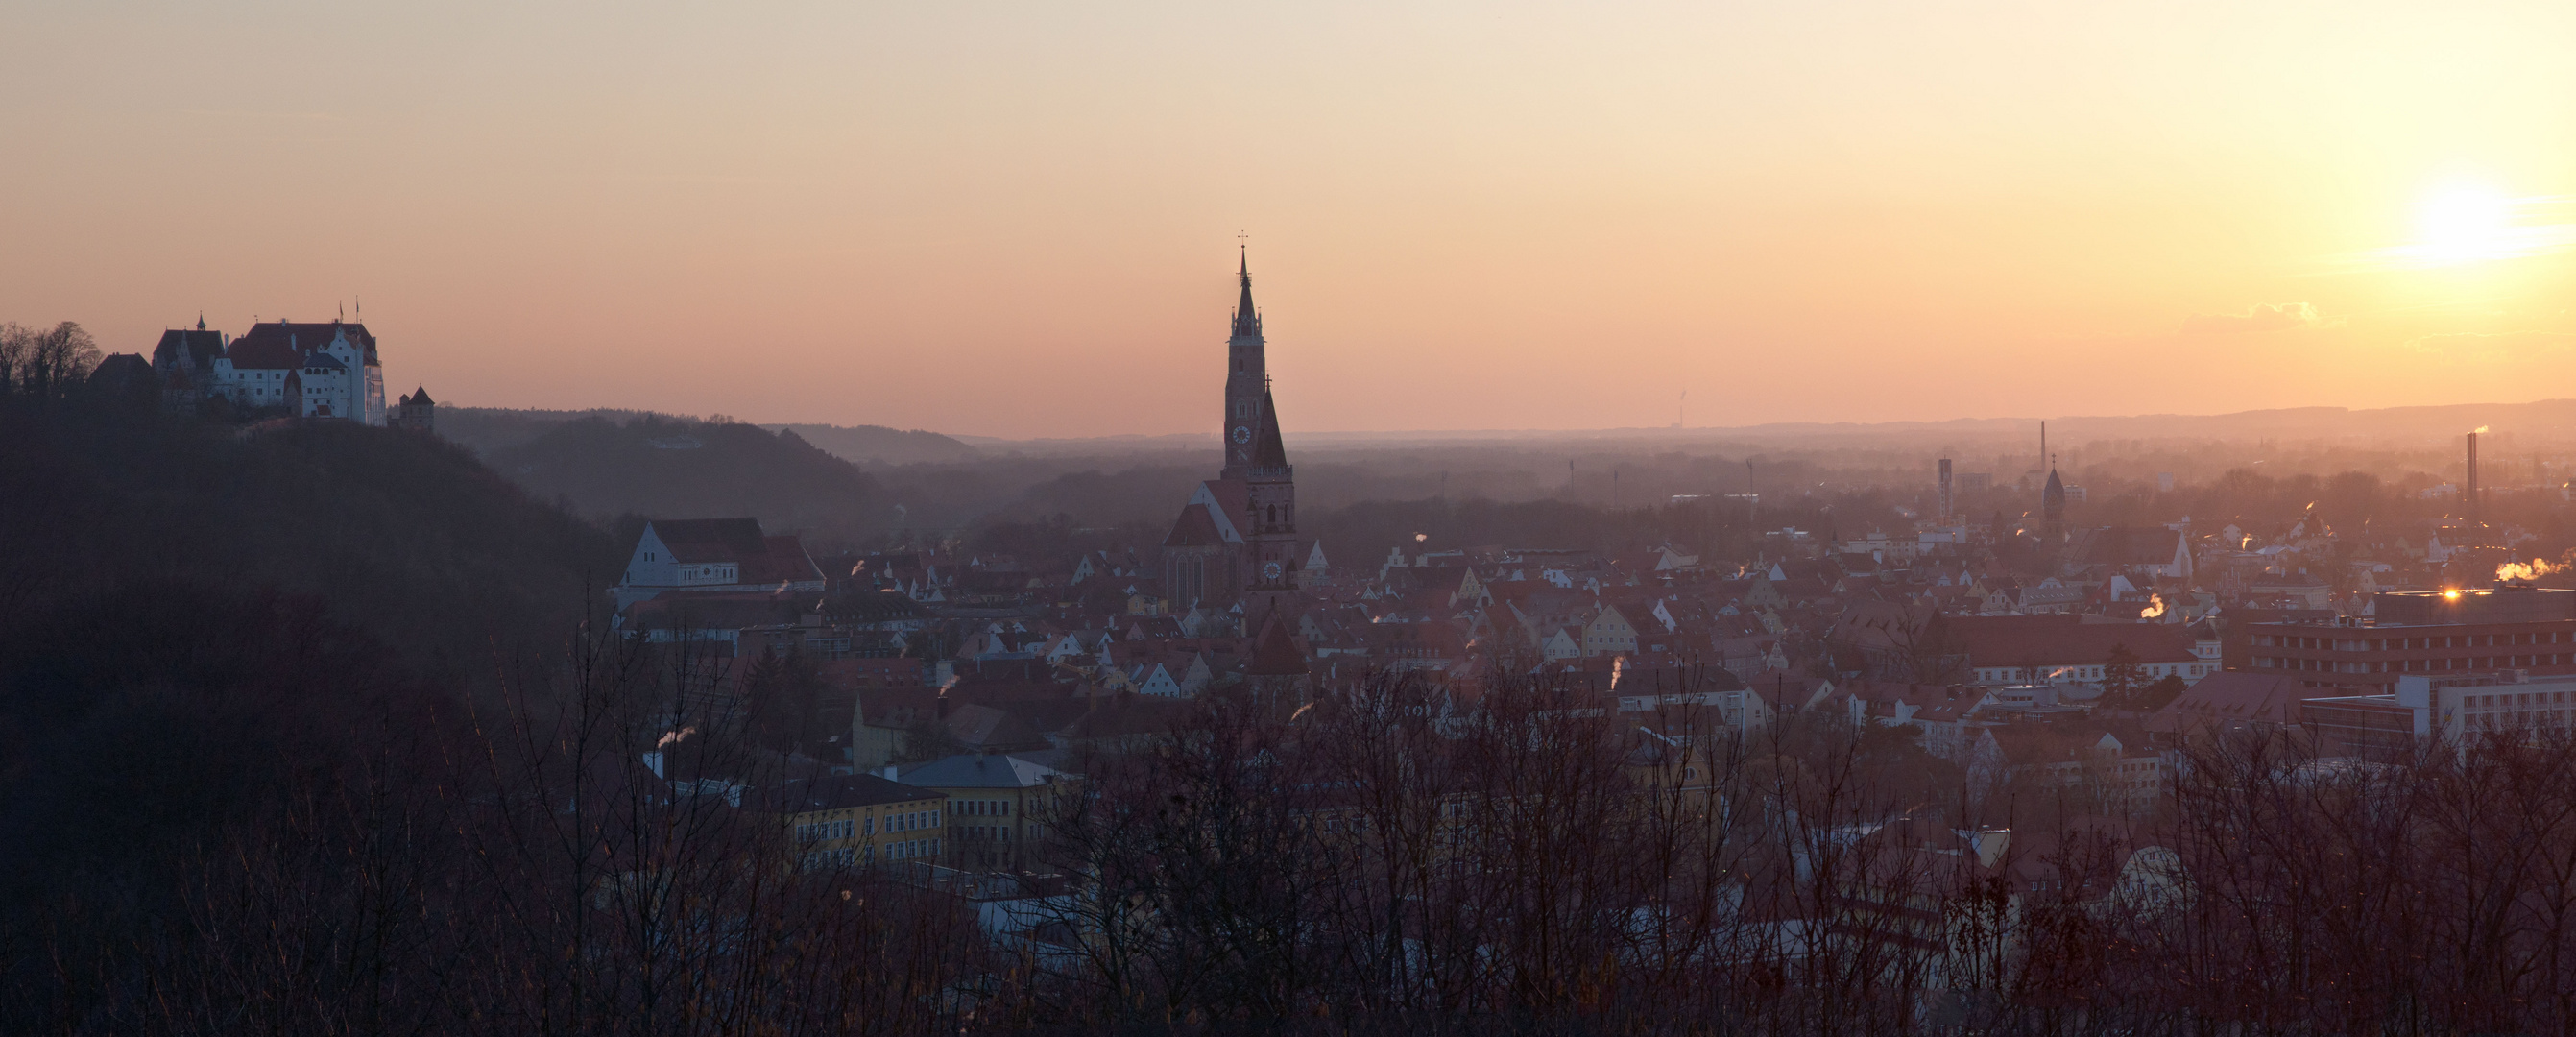 Panorama Landshut bei Sonnenuntergang